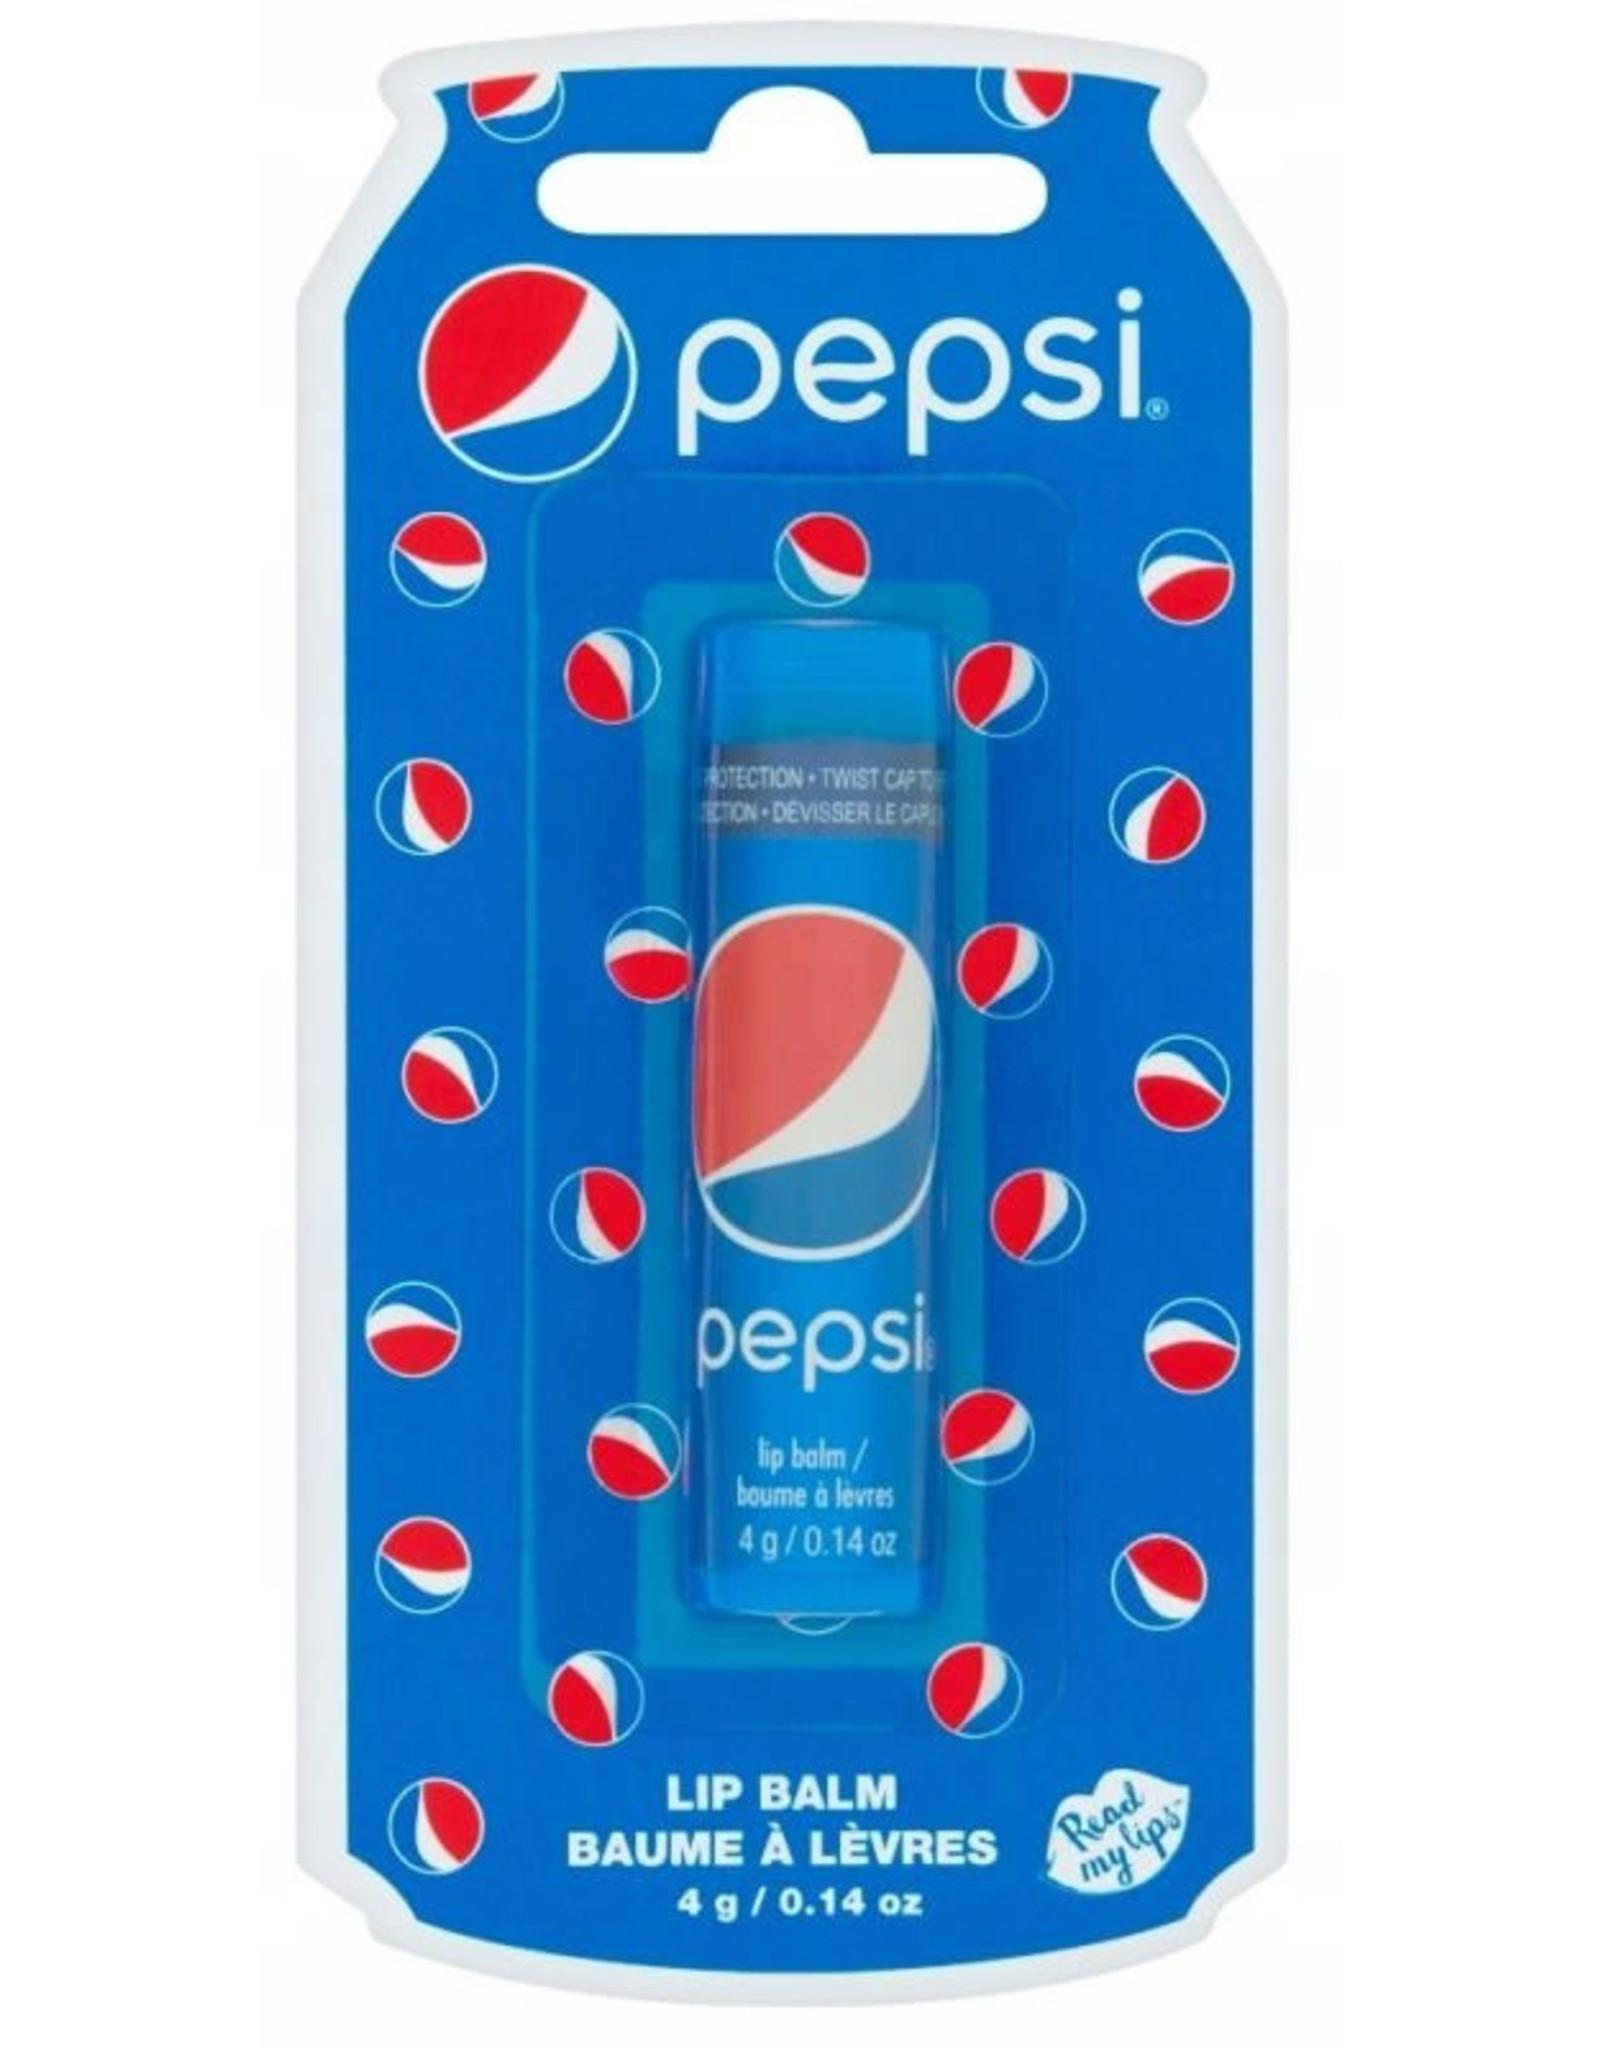 Pepsi Lip Balm